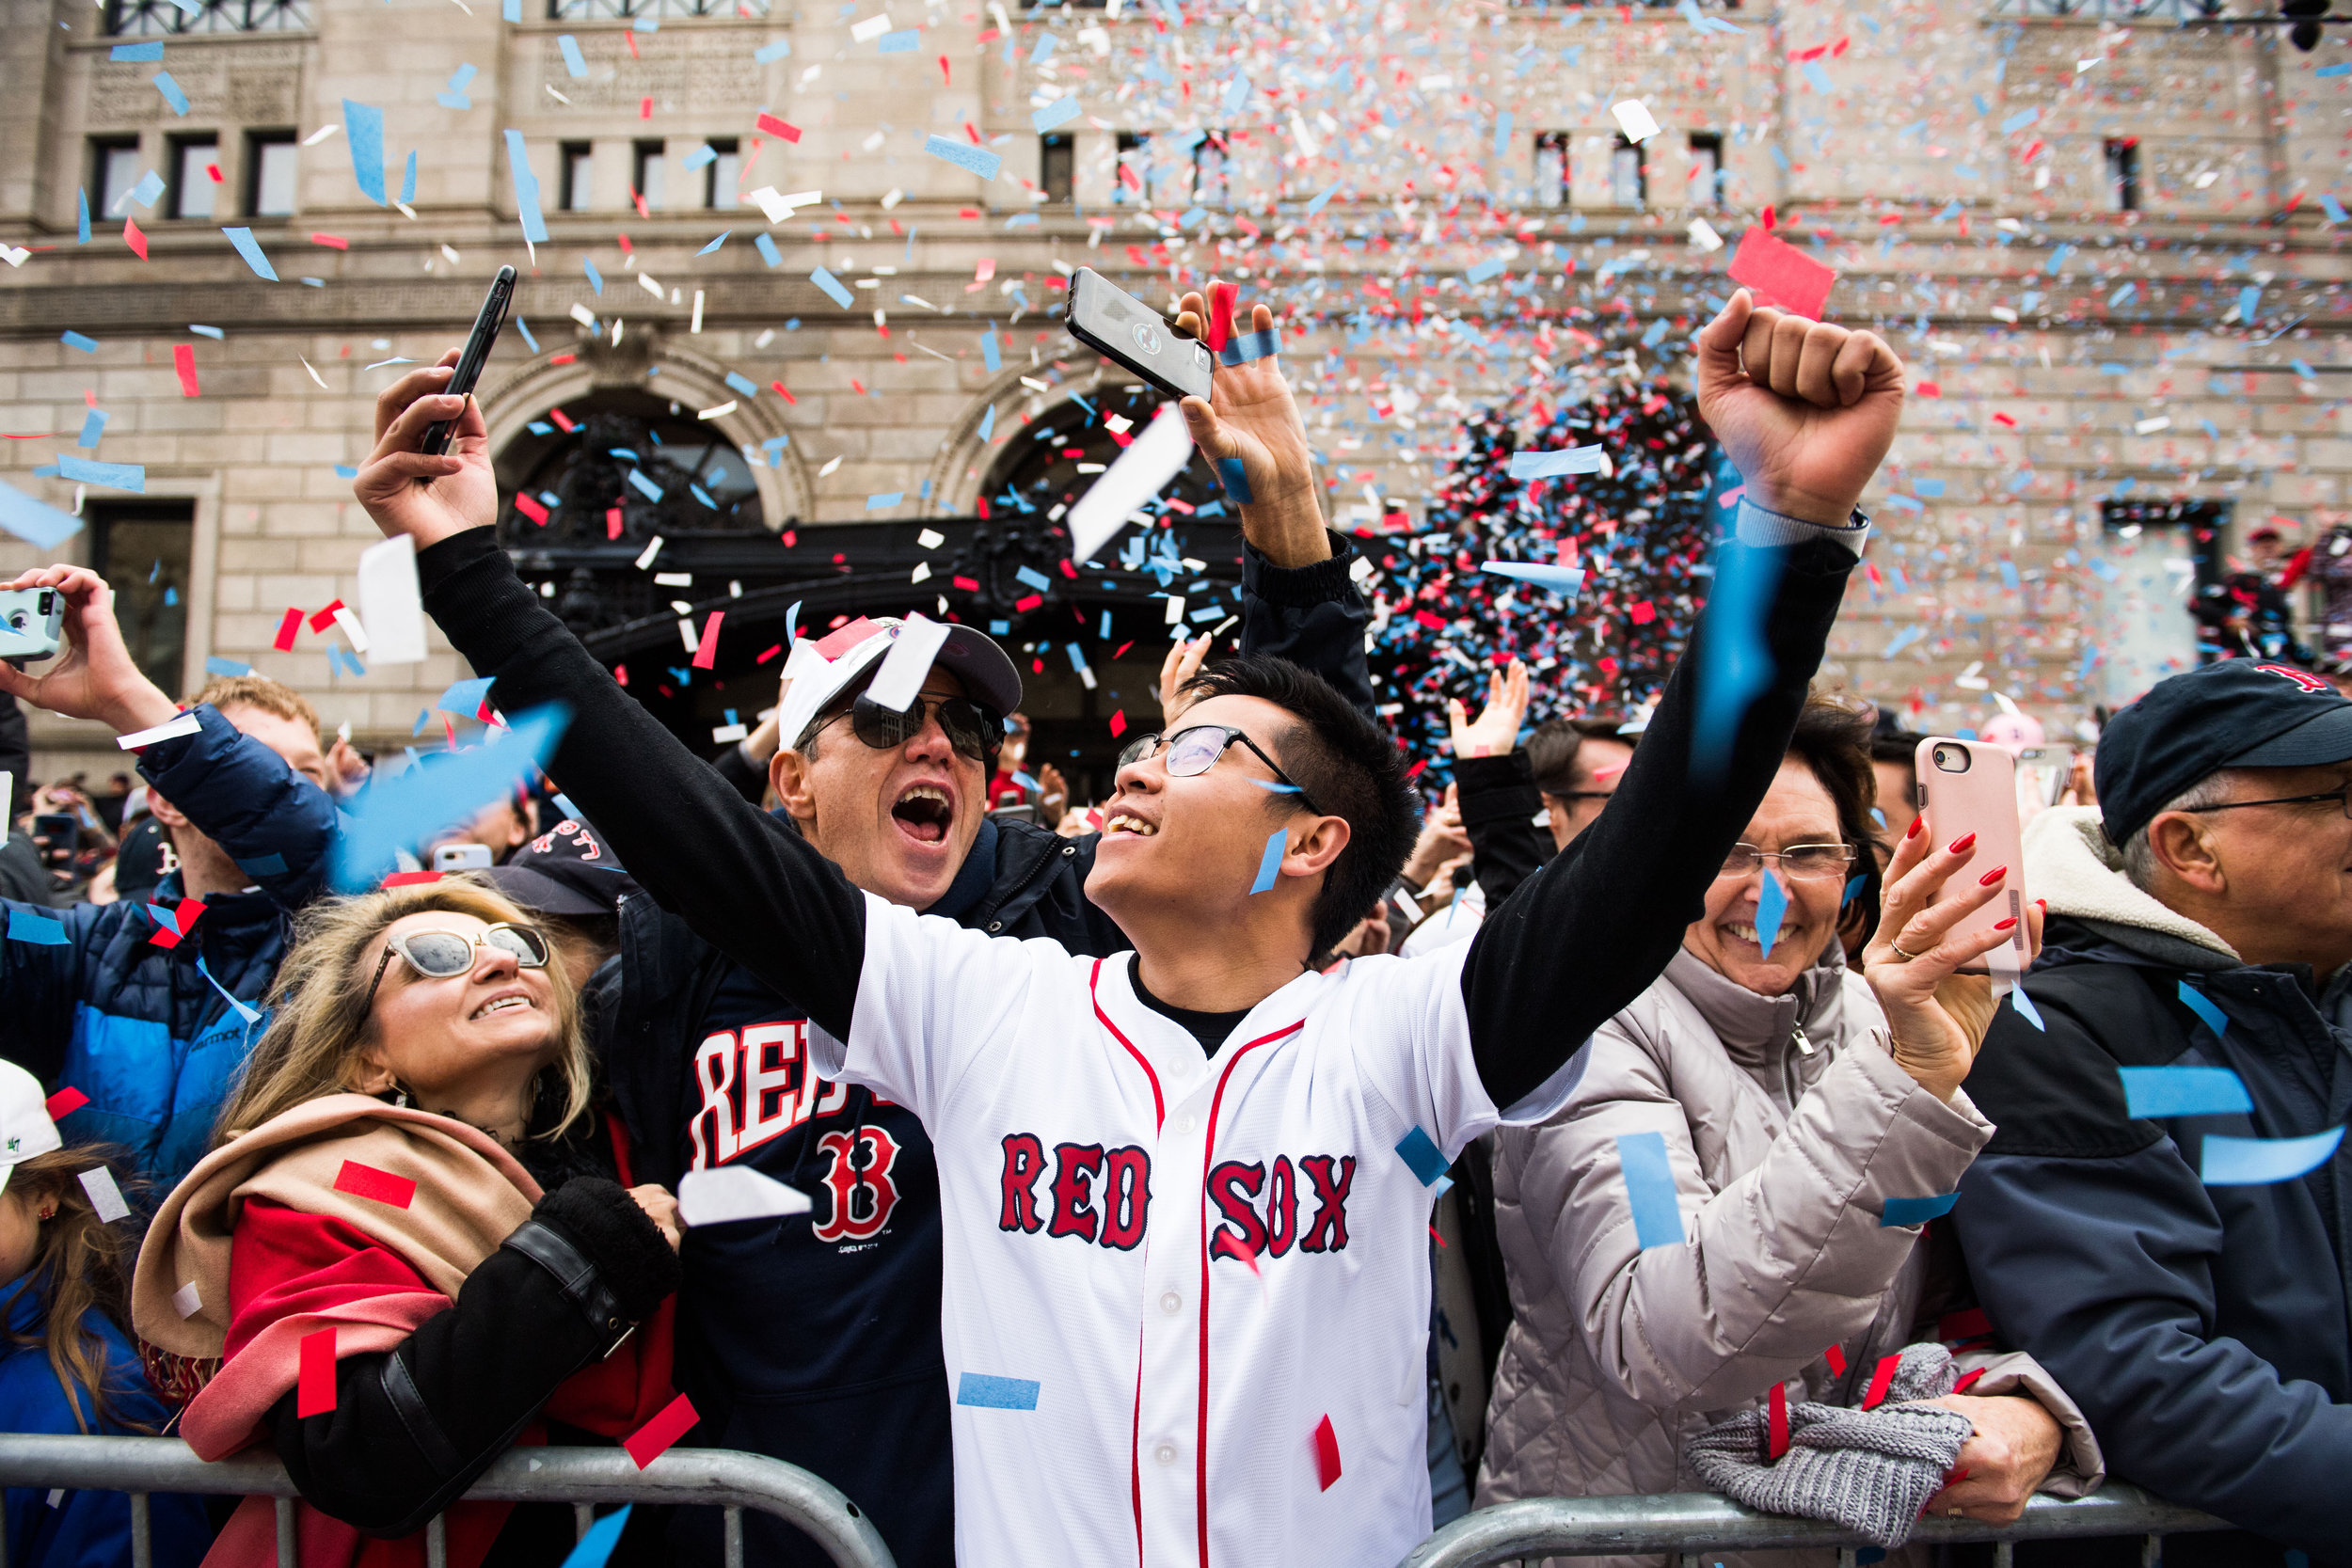 @k__h__r - Rex Sox Parade, Boston, MA